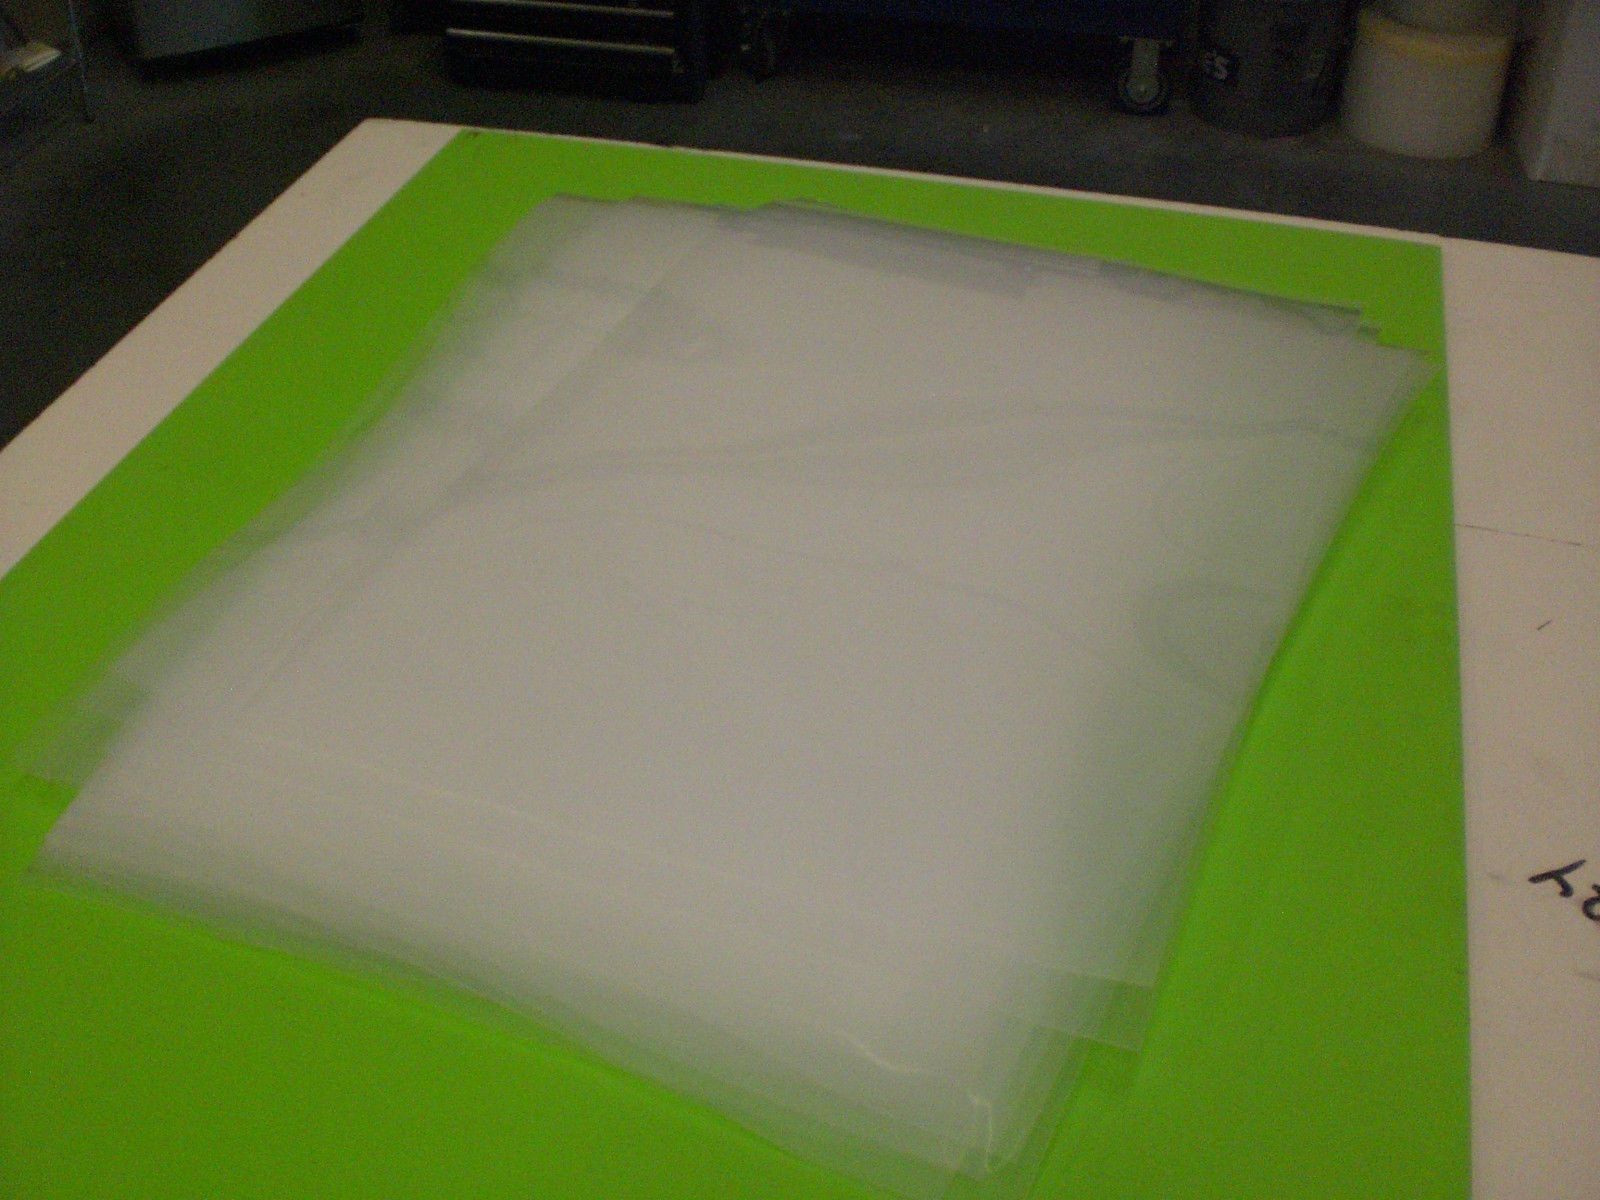 White Polyethylene Hdpe Plastic Sheets 0 030 X 24 X24 Vacuum Forming Vacuum Forming Hdpe Plastic Plastic Industry